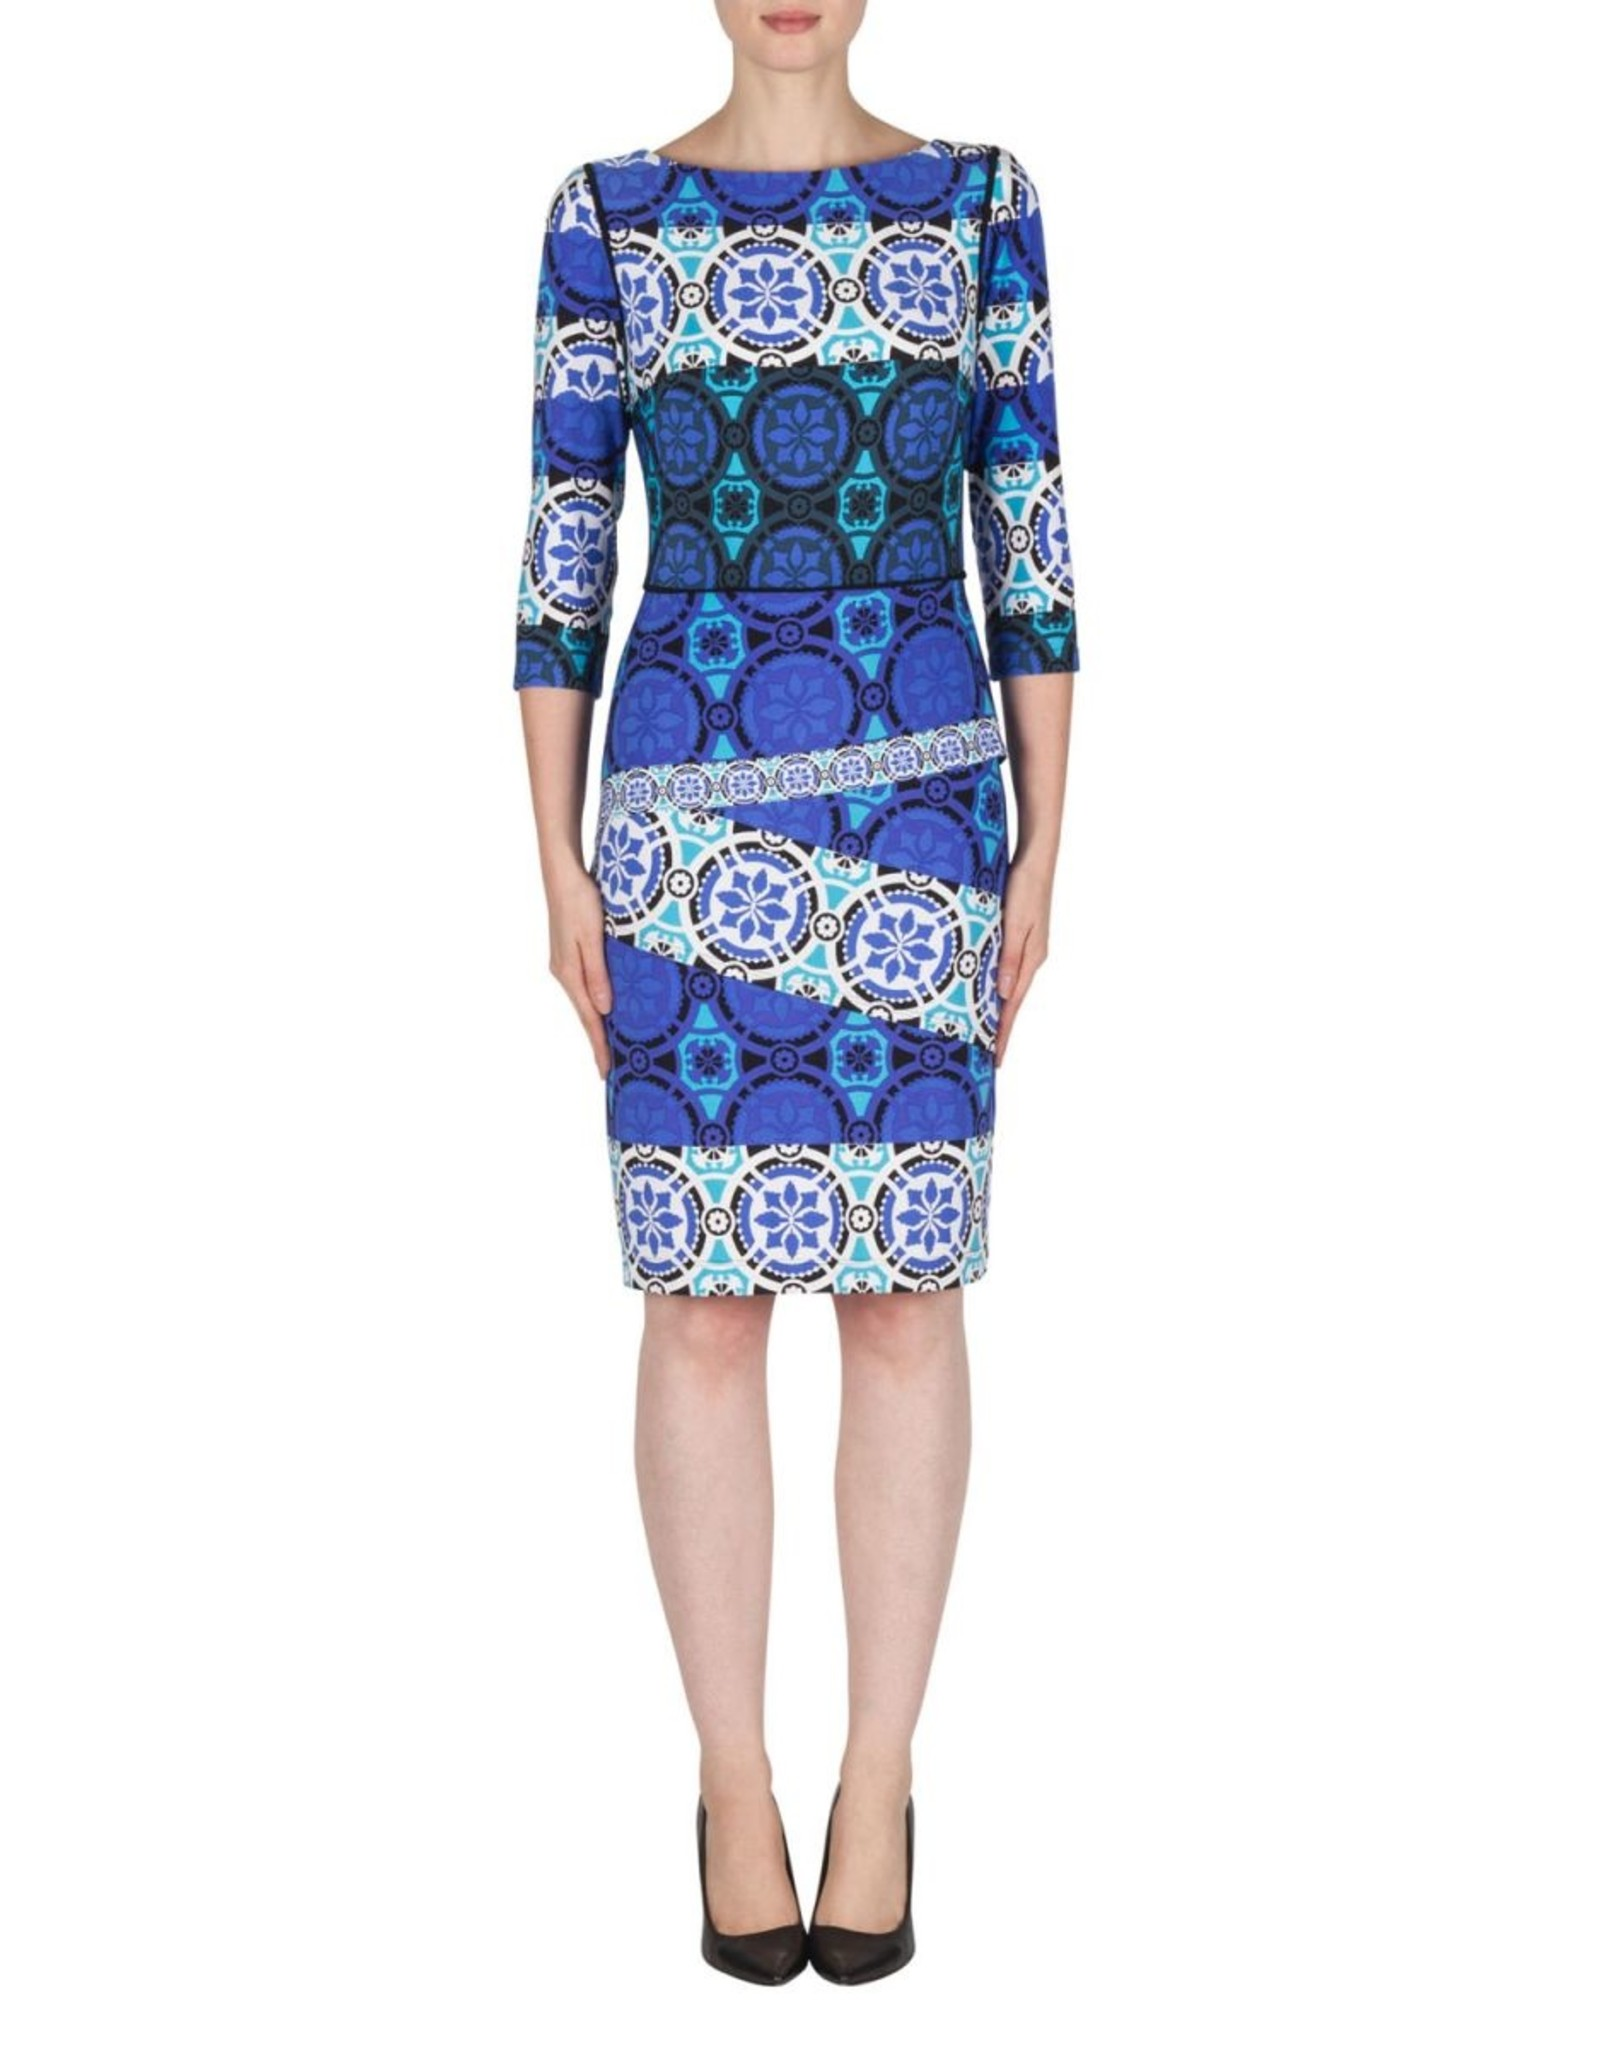 Joseph Ribkoff Joseph Ribkoff Blue/Multi Dress Size 10